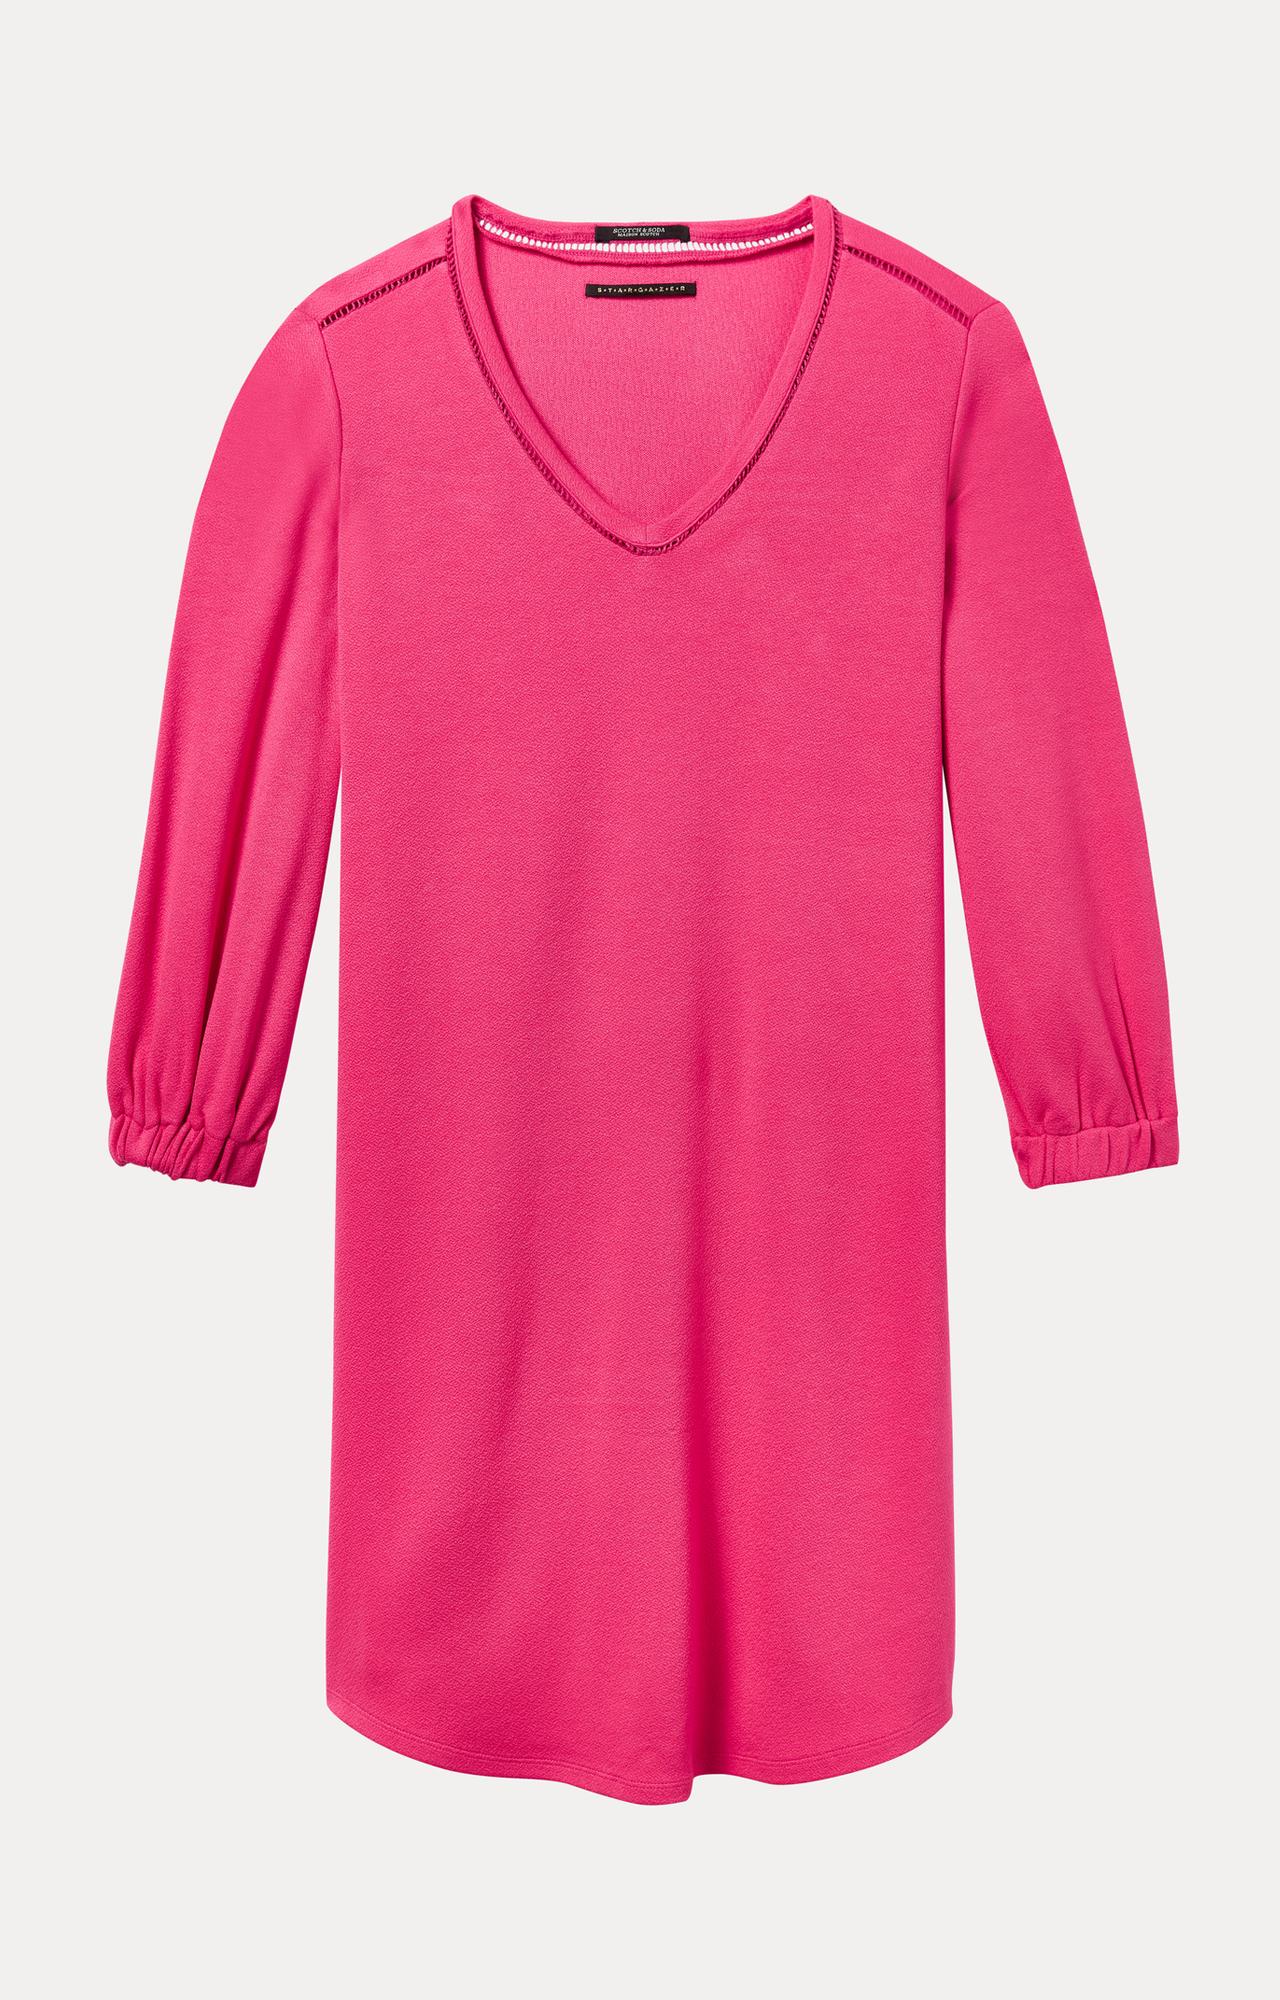 Scotch & Soda | Electric Pink Melange Shift Dress